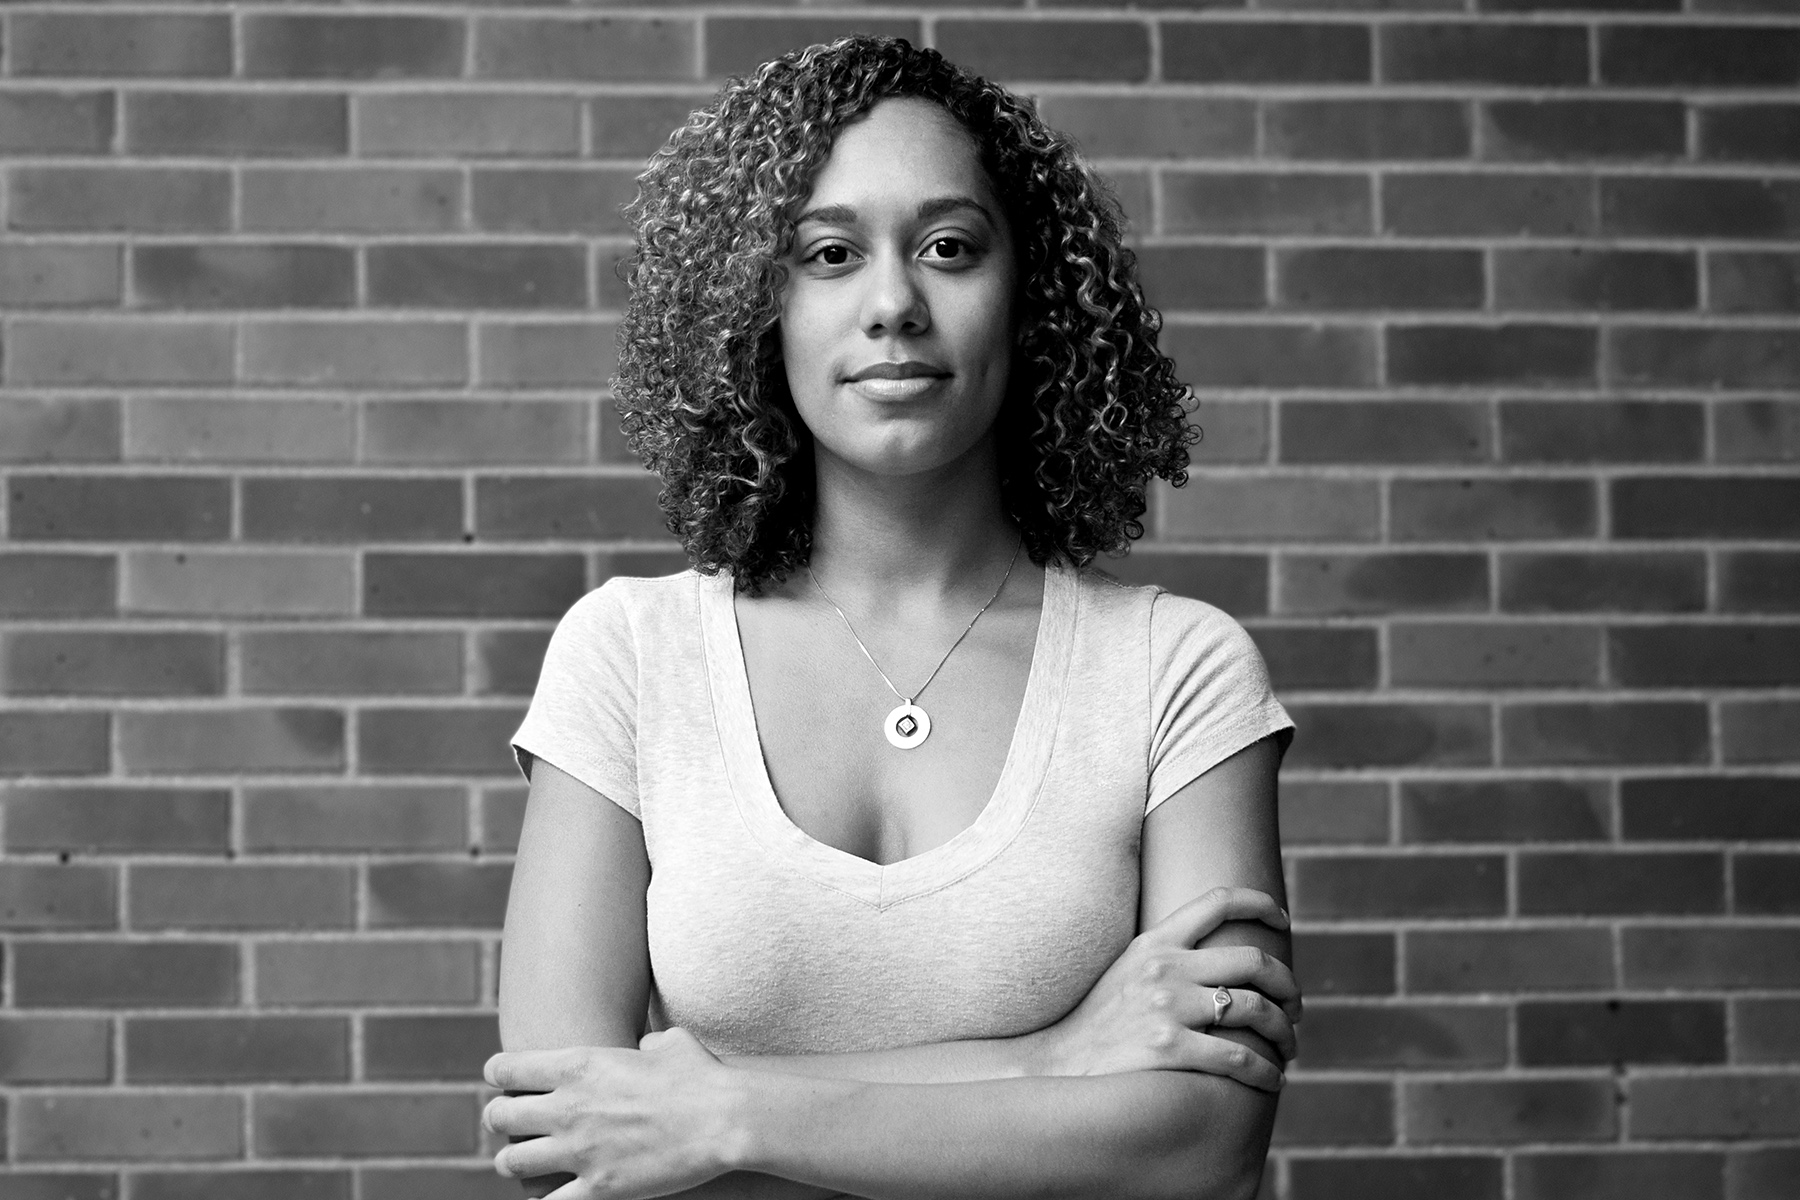 Tabia Santos. BA. Barnard College. Current: MD candidate at Zucker School of Medicine at Hofstra/Northwell